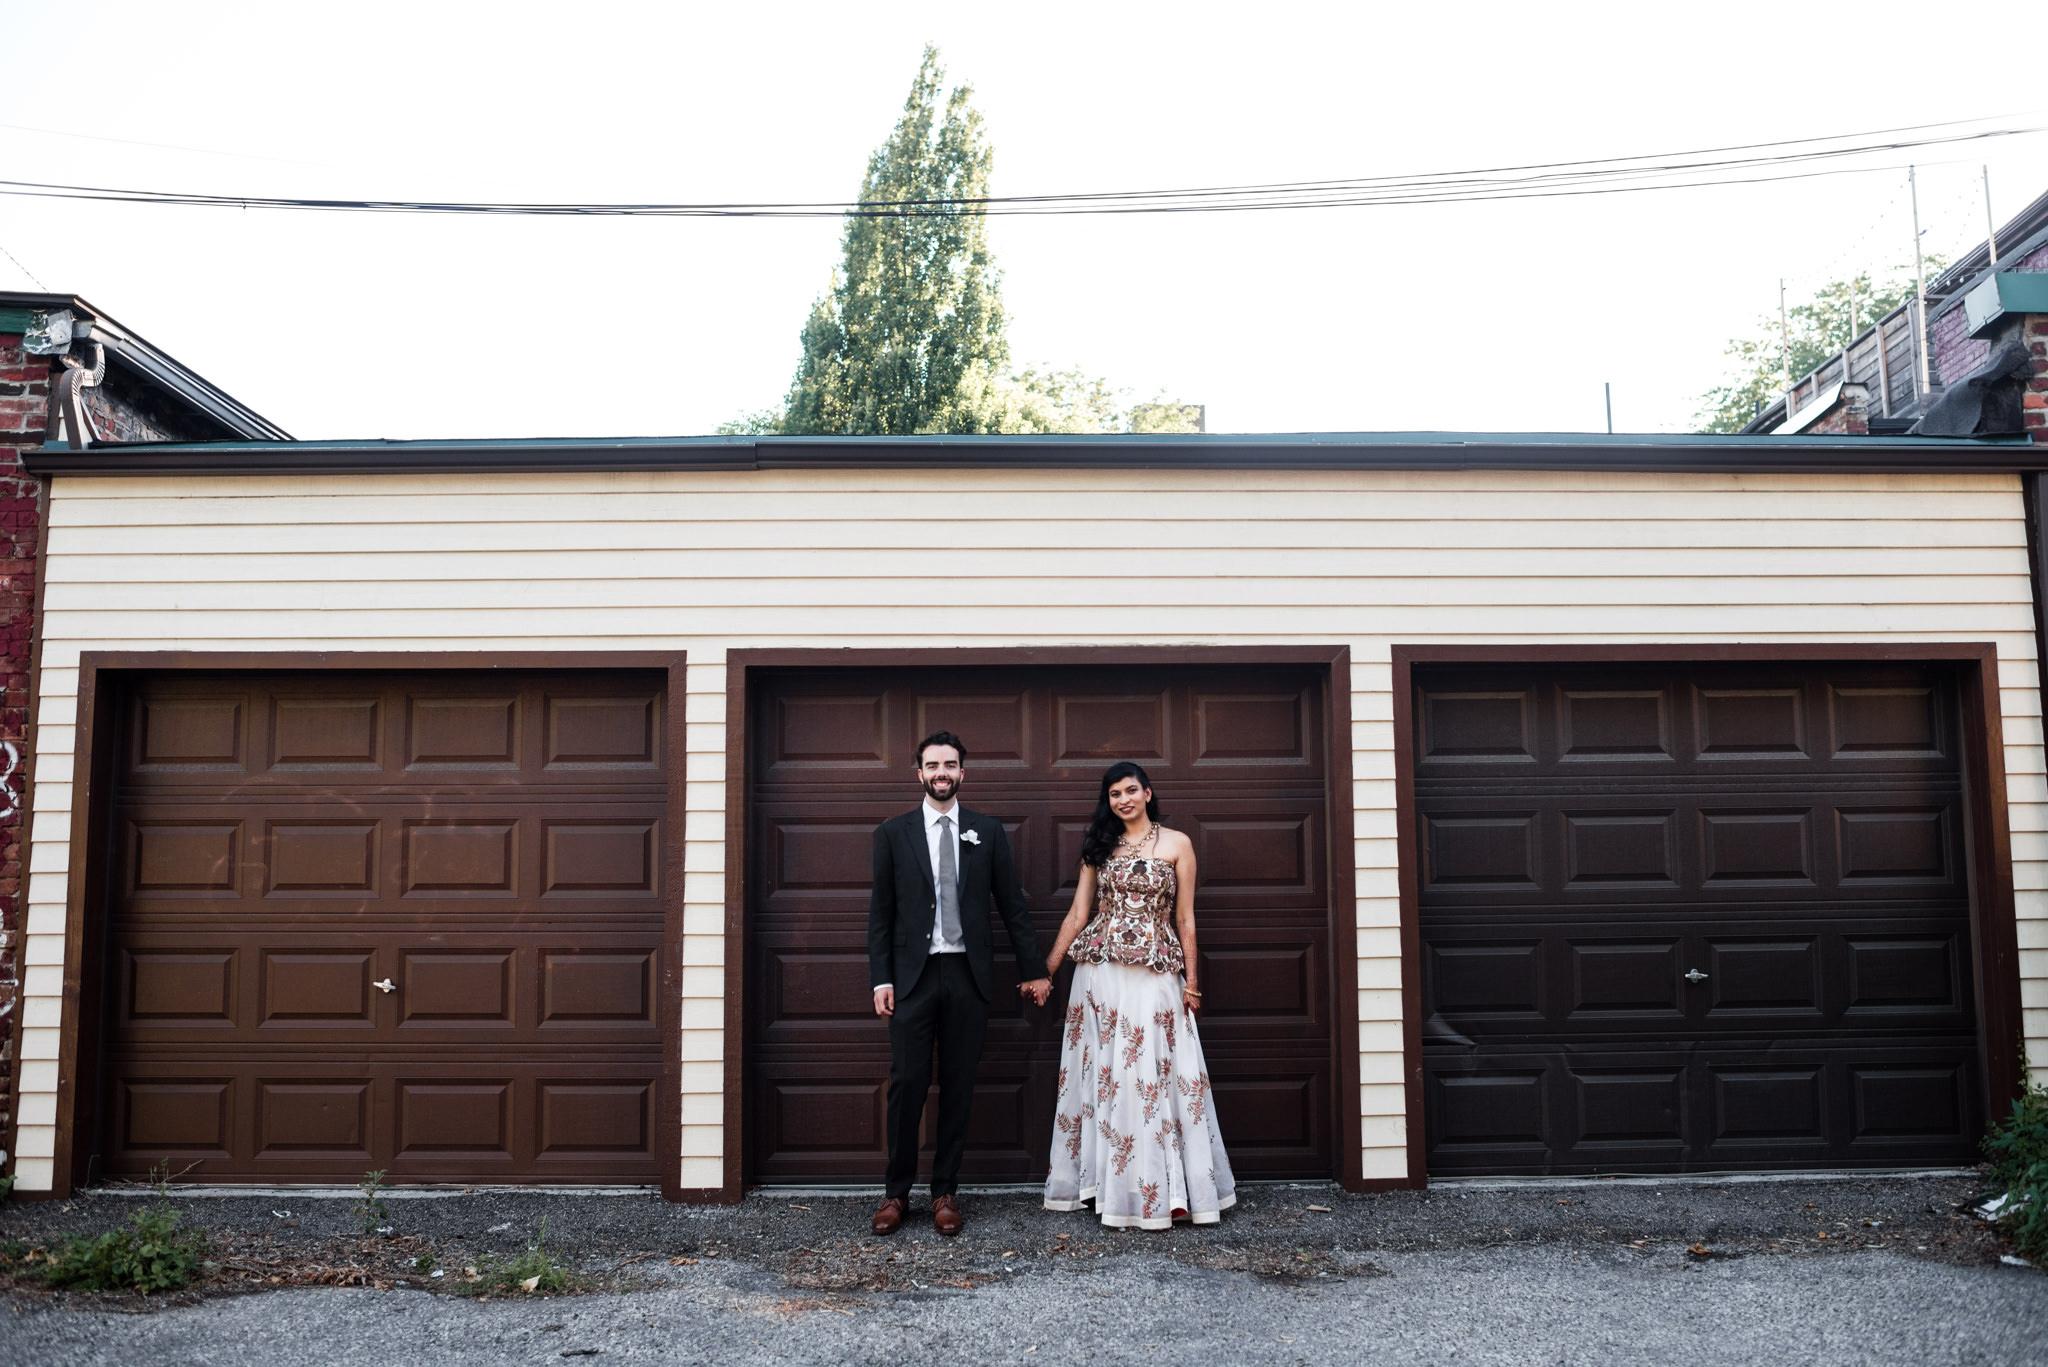 056-bride-groom-couple-wedding-photos-downtown-toronto-hotel-ocho.jpg